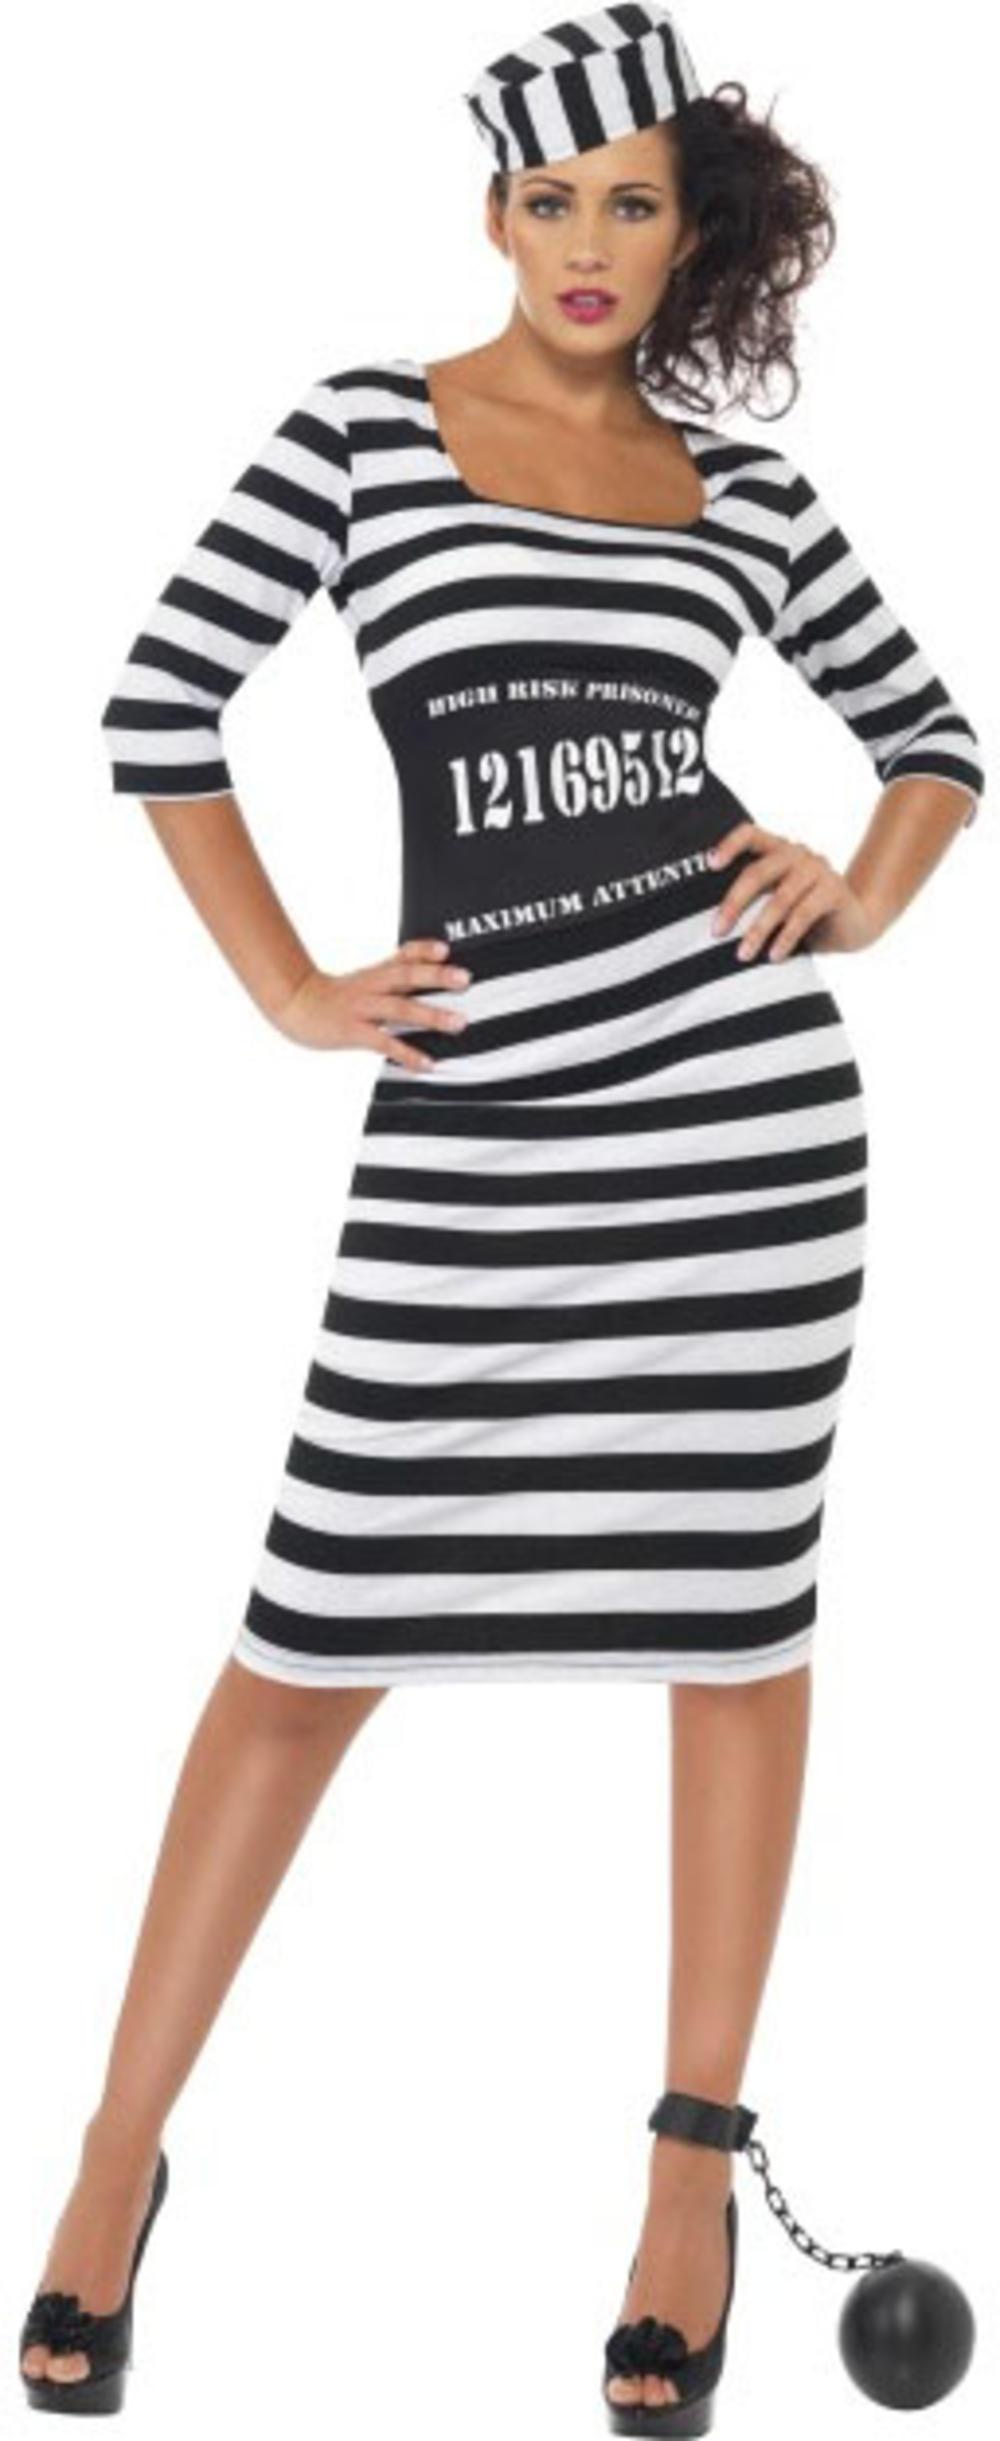 Sexy Classy Convict Ladies Cops & Robbers Prisoner Hen Party Fancy Dress Costume